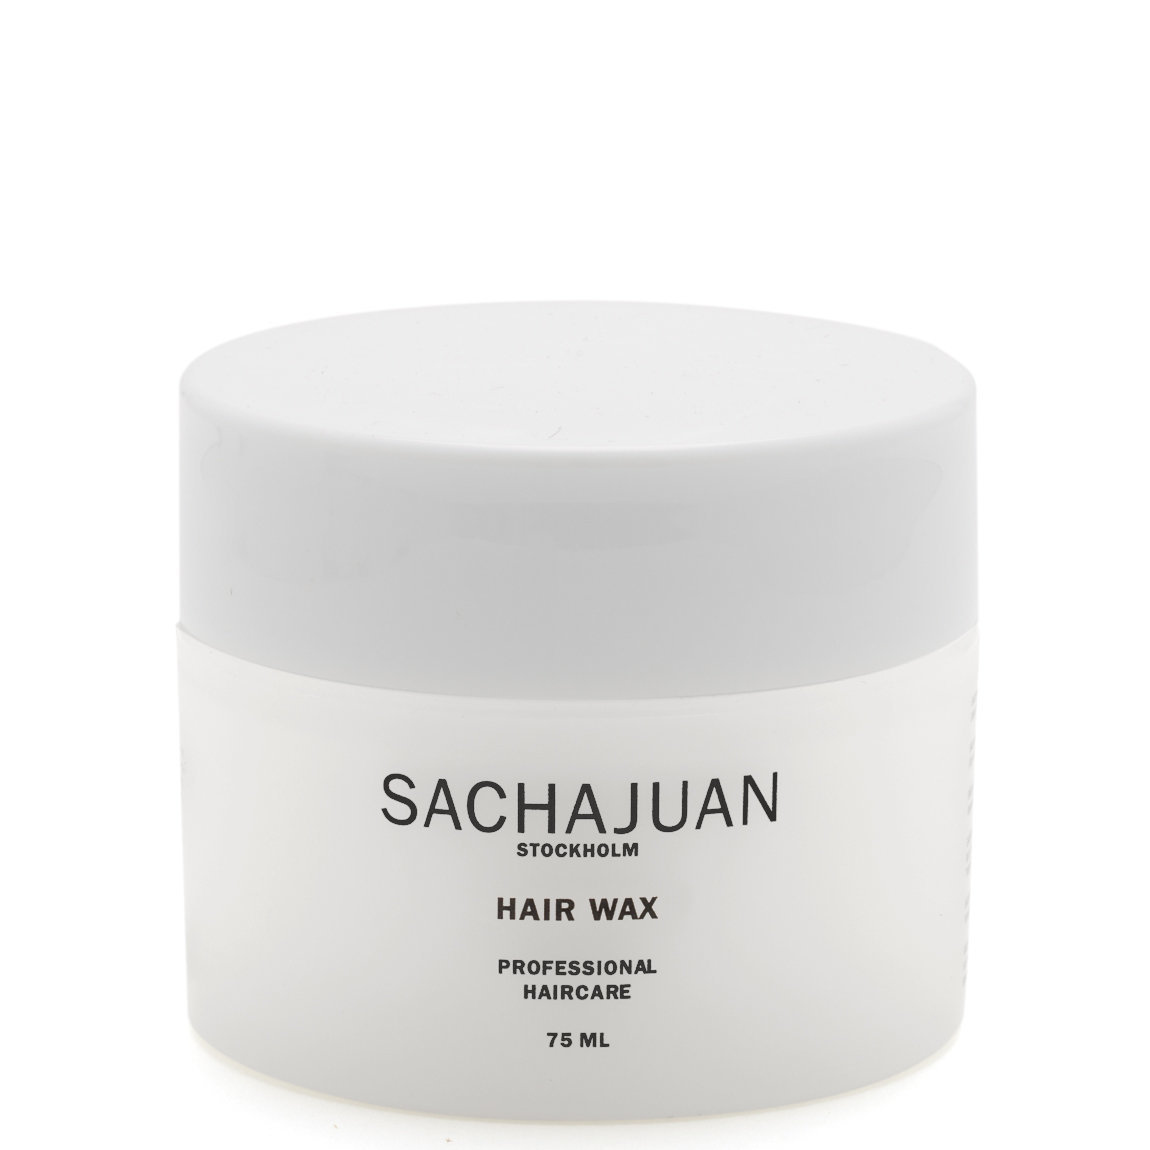 SACHAJUAN Hair Wax product swatch.